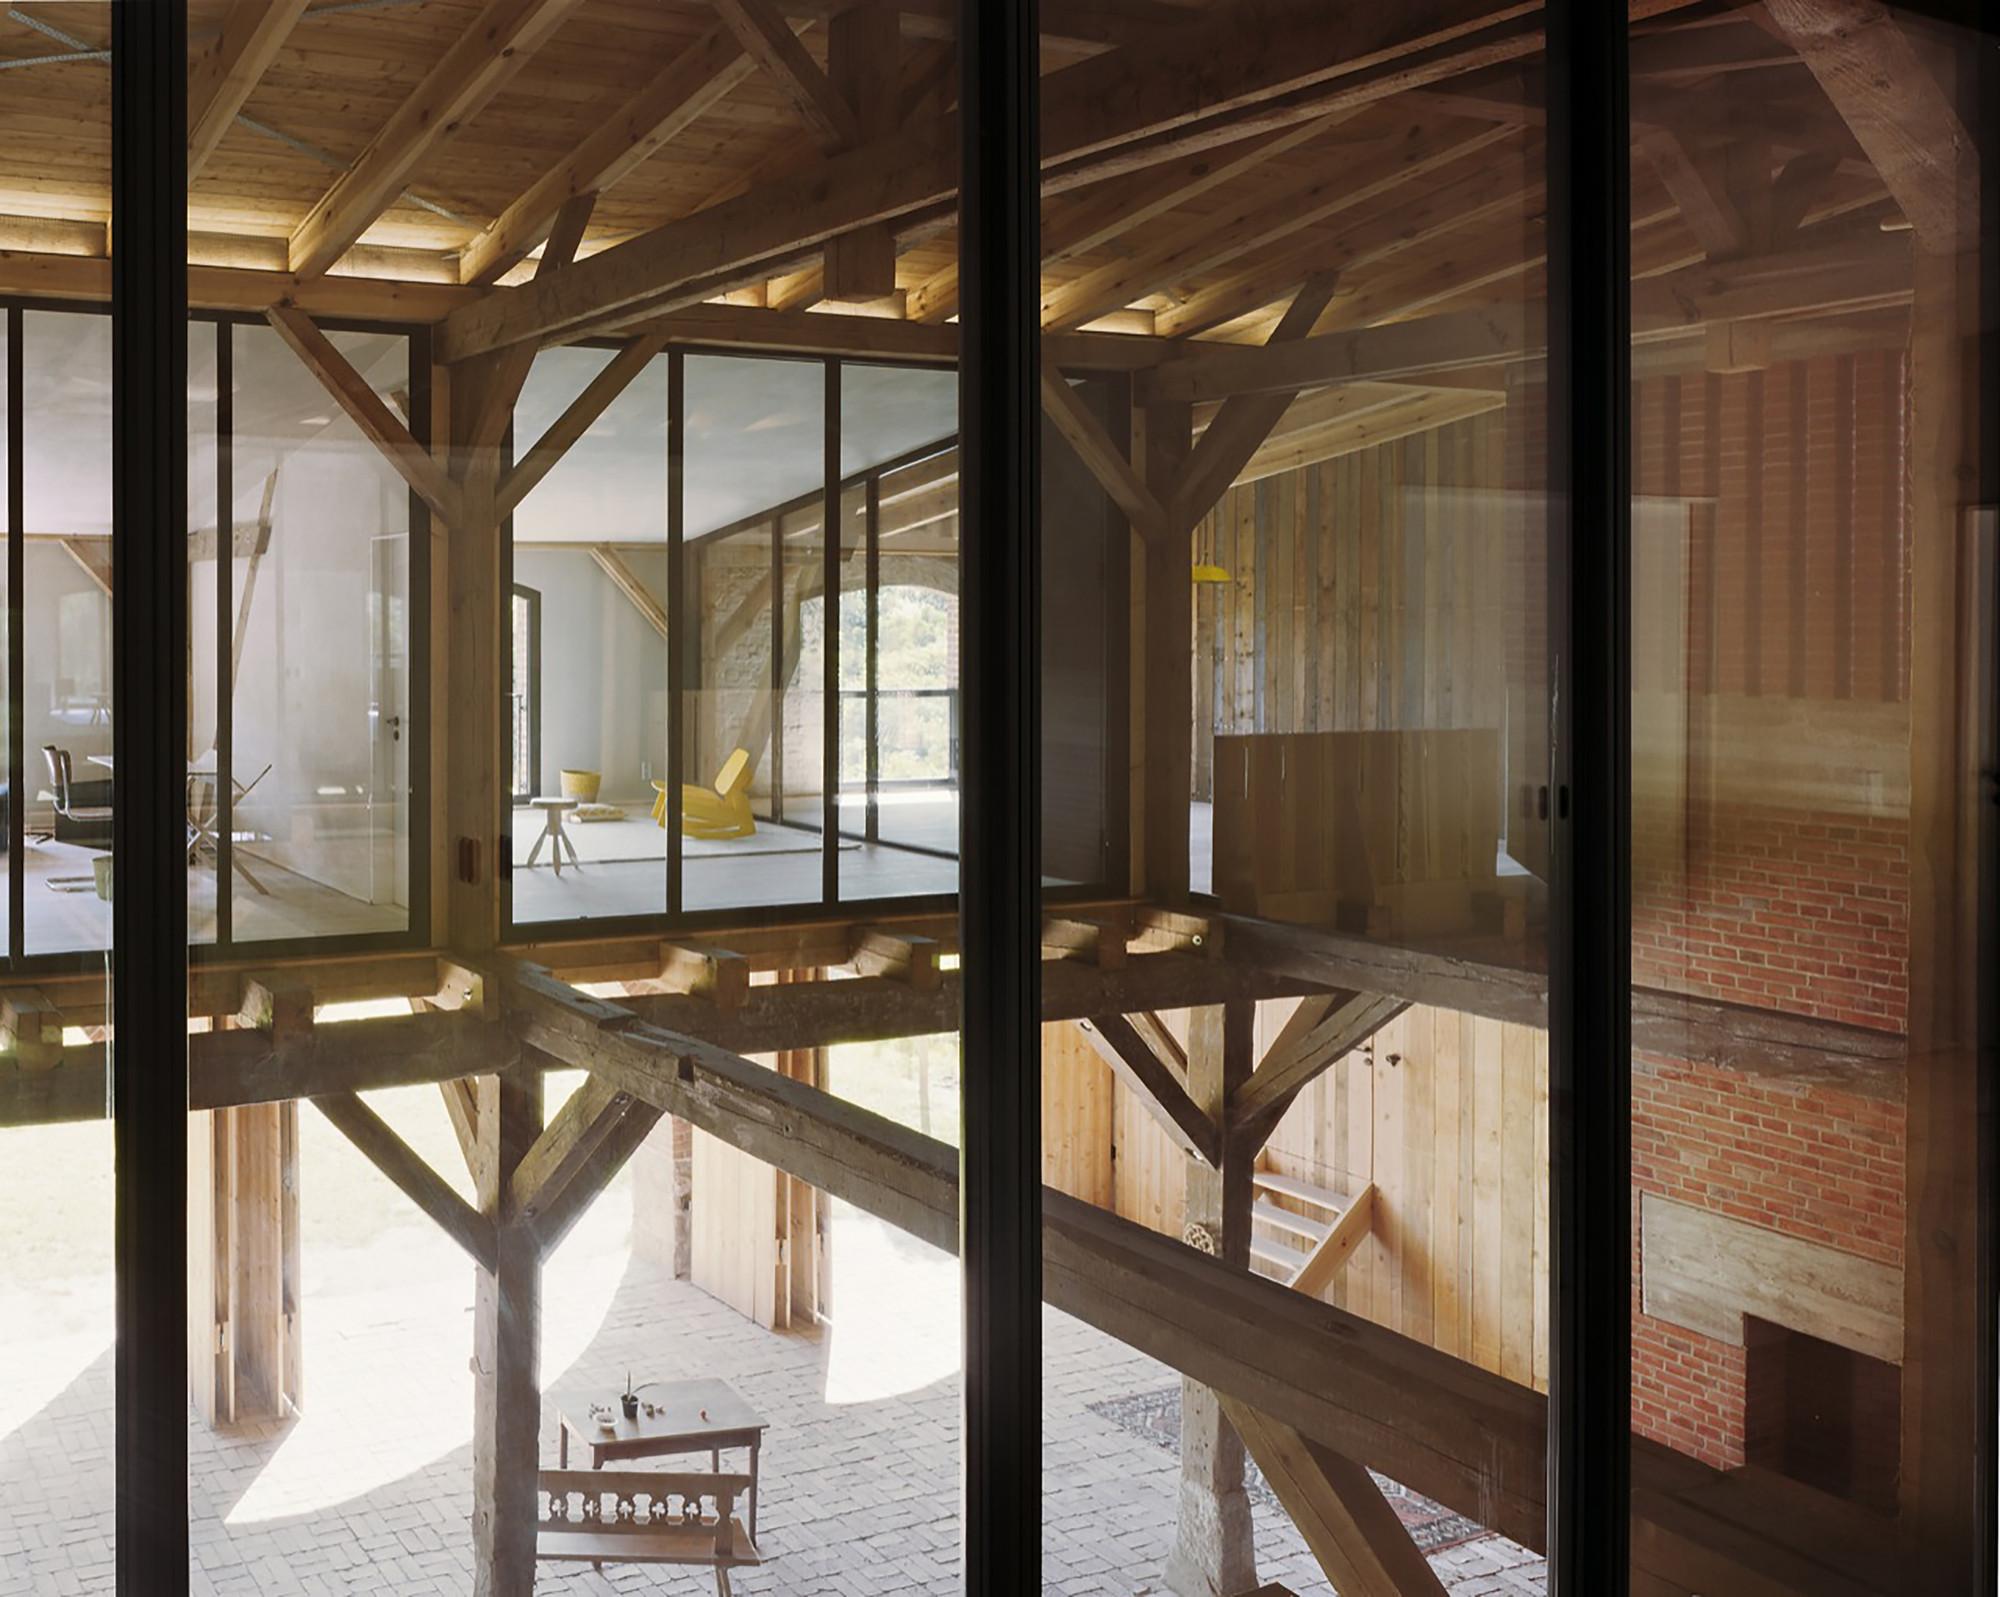 gallery of landhaus thomas kr ger architekt 10. Black Bedroom Furniture Sets. Home Design Ideas